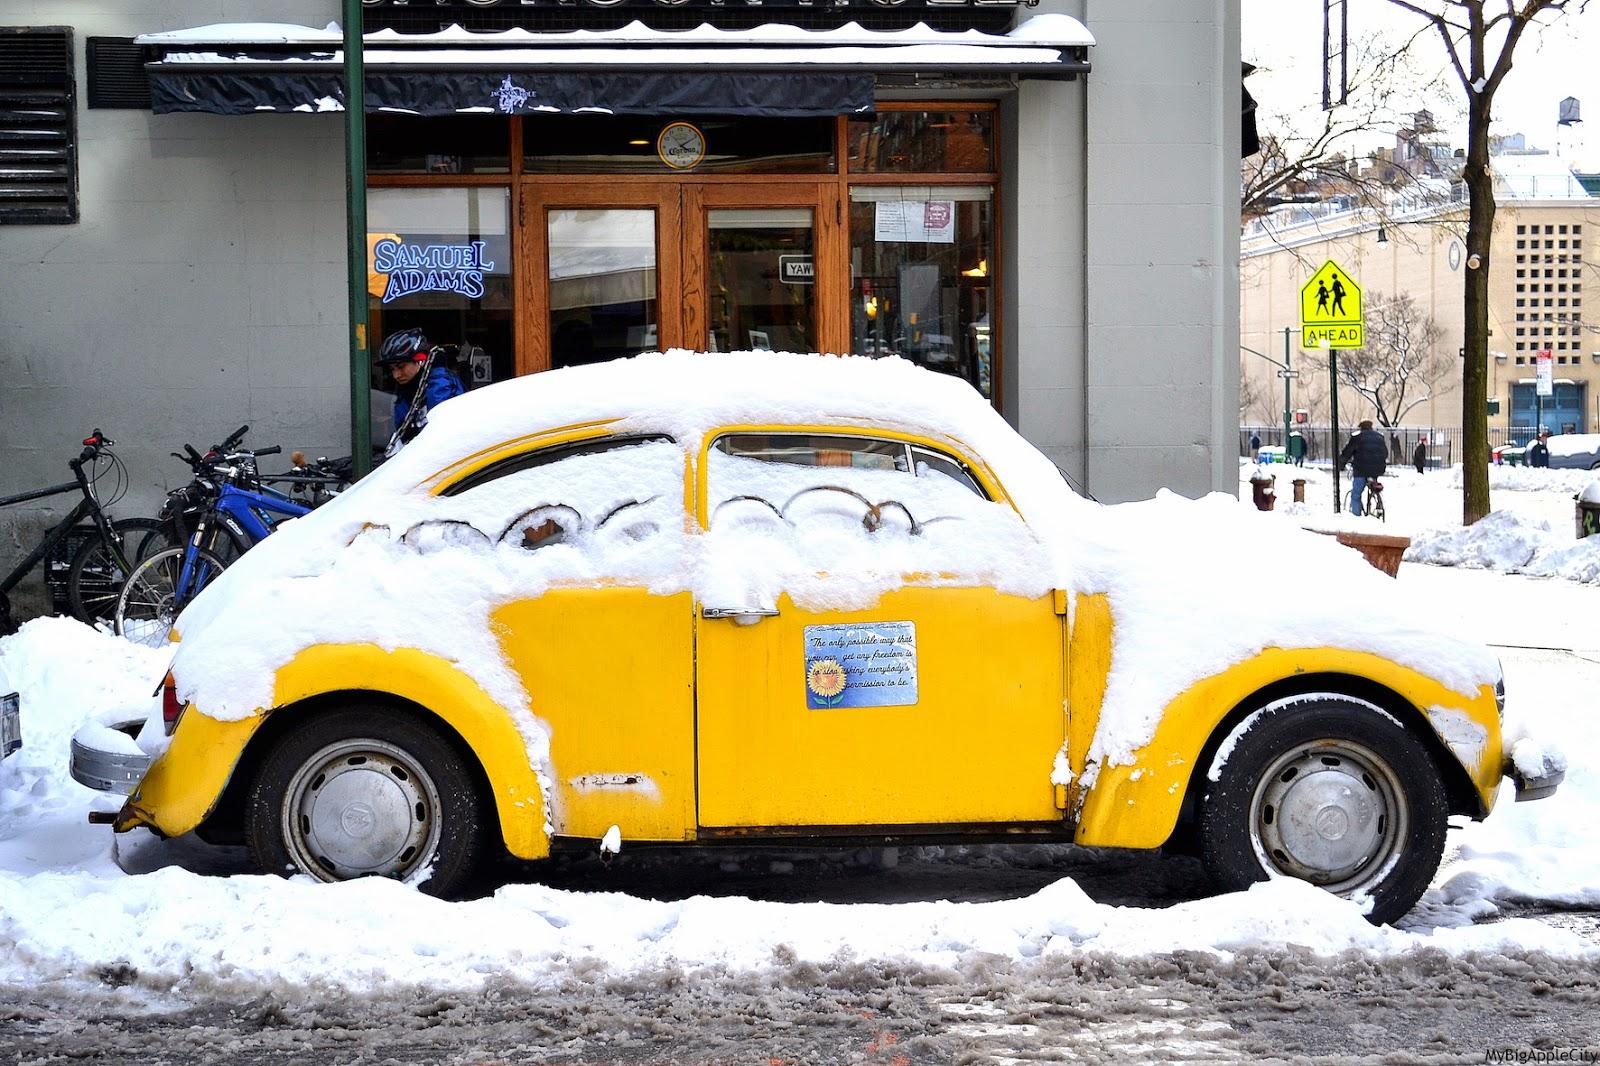 juno-2015-NYC-Blizzard-Travelblog-vintage